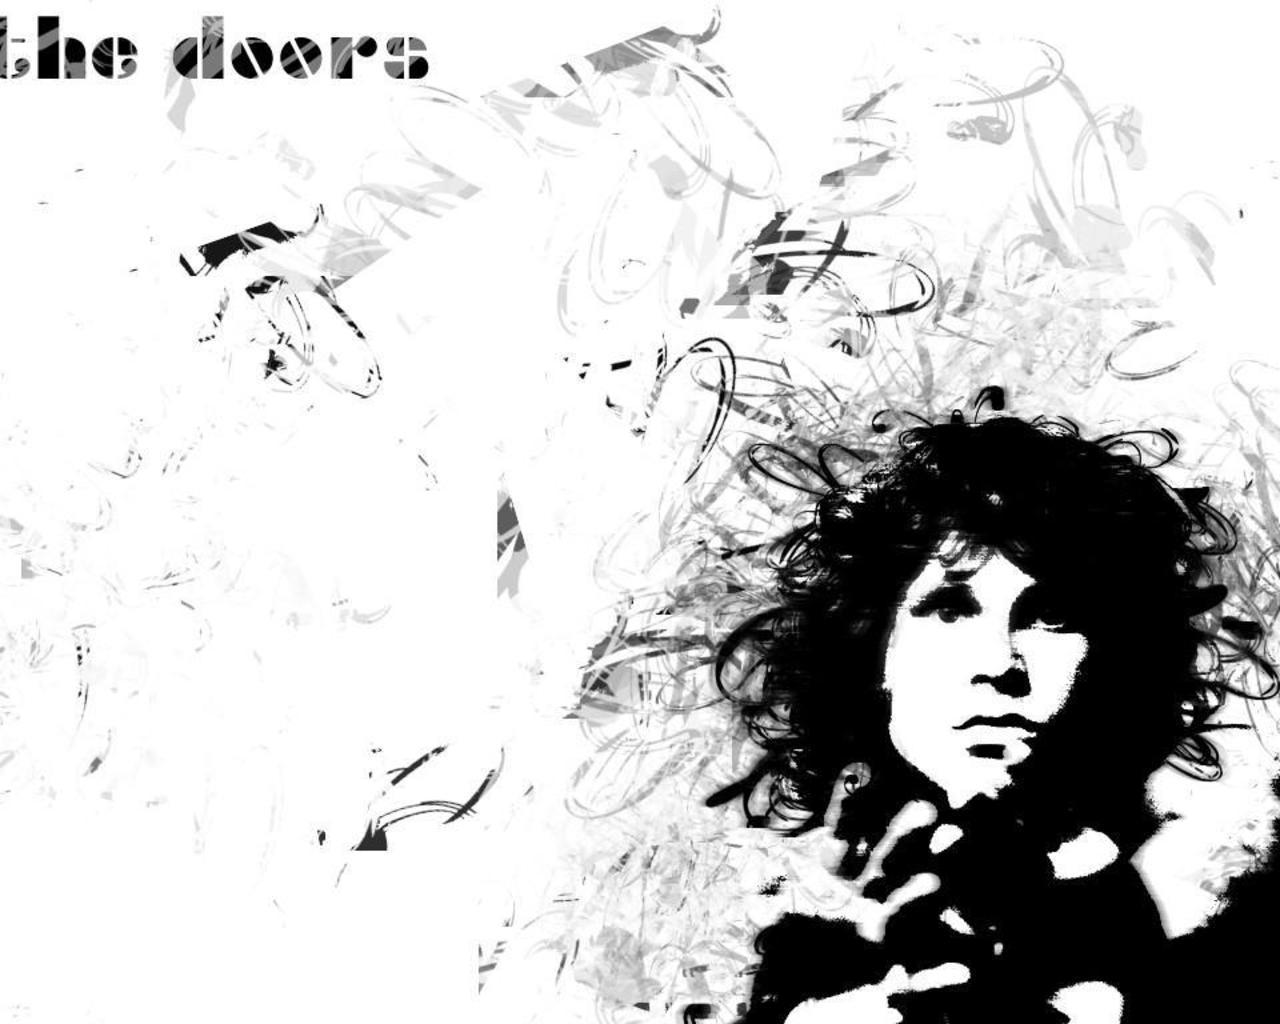 Classic Rock the Doors Wallpaper